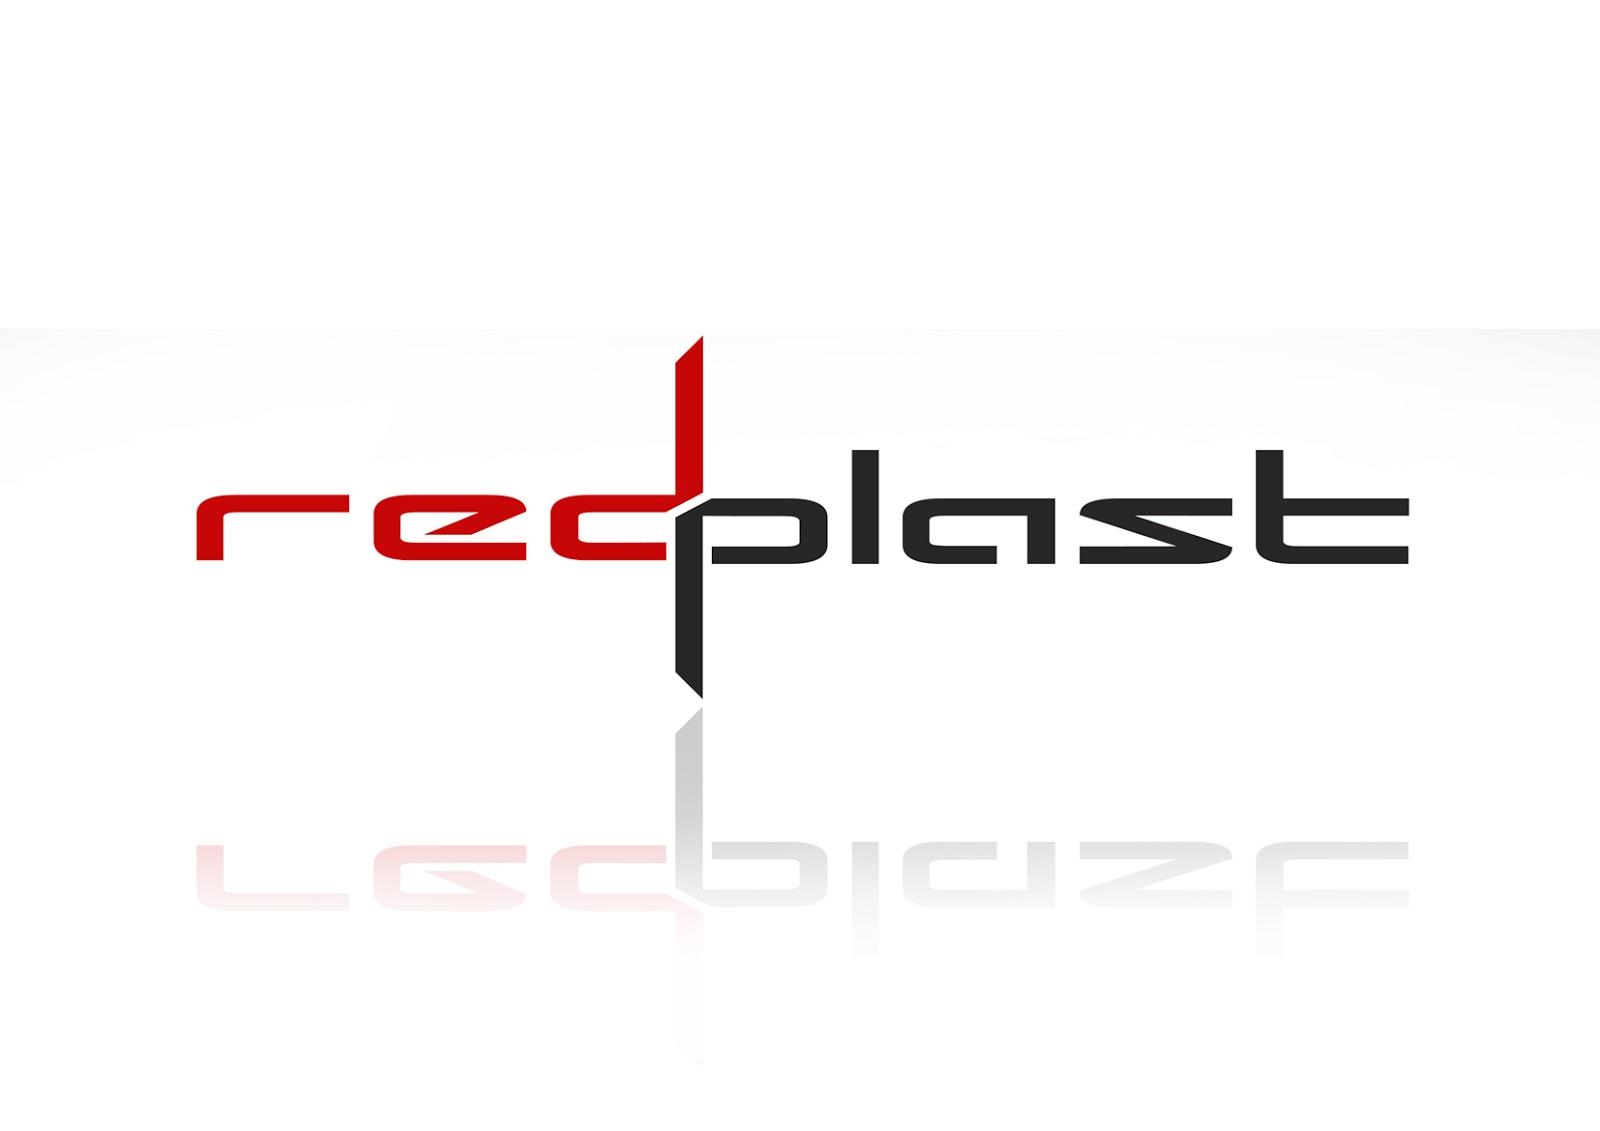 http://3.bp.blogspot.com/-0TjS5tv9P0s/ThoPjJrOETI/AAAAAAAAAbQ/9y80ajJLsik/s1600/redpalst3+copy.jpg